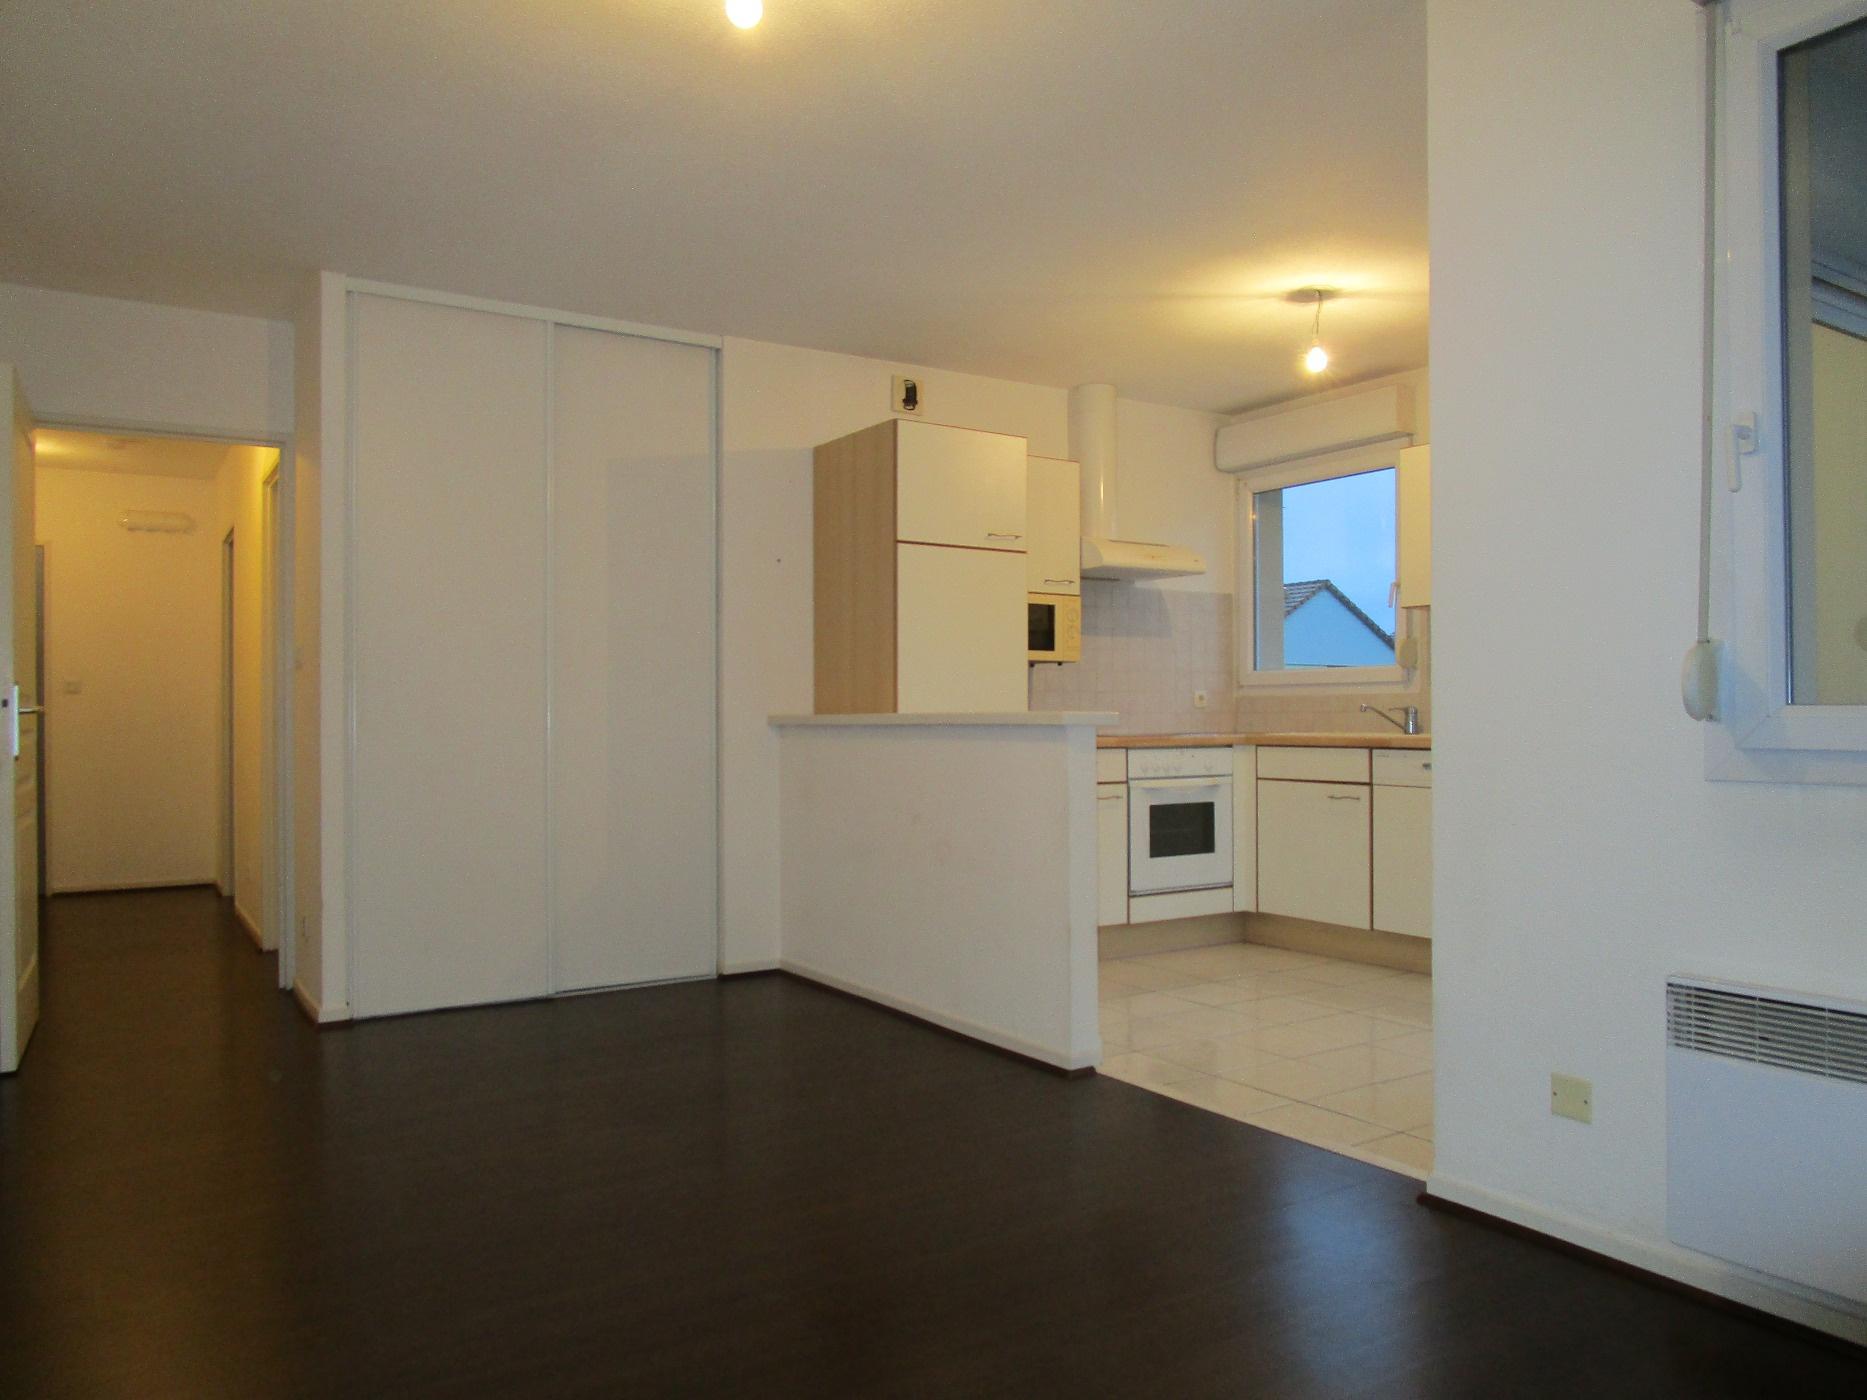 Appartement t1 bis balcon garage proche etang des forges 2 - Piscine belfort residence ...